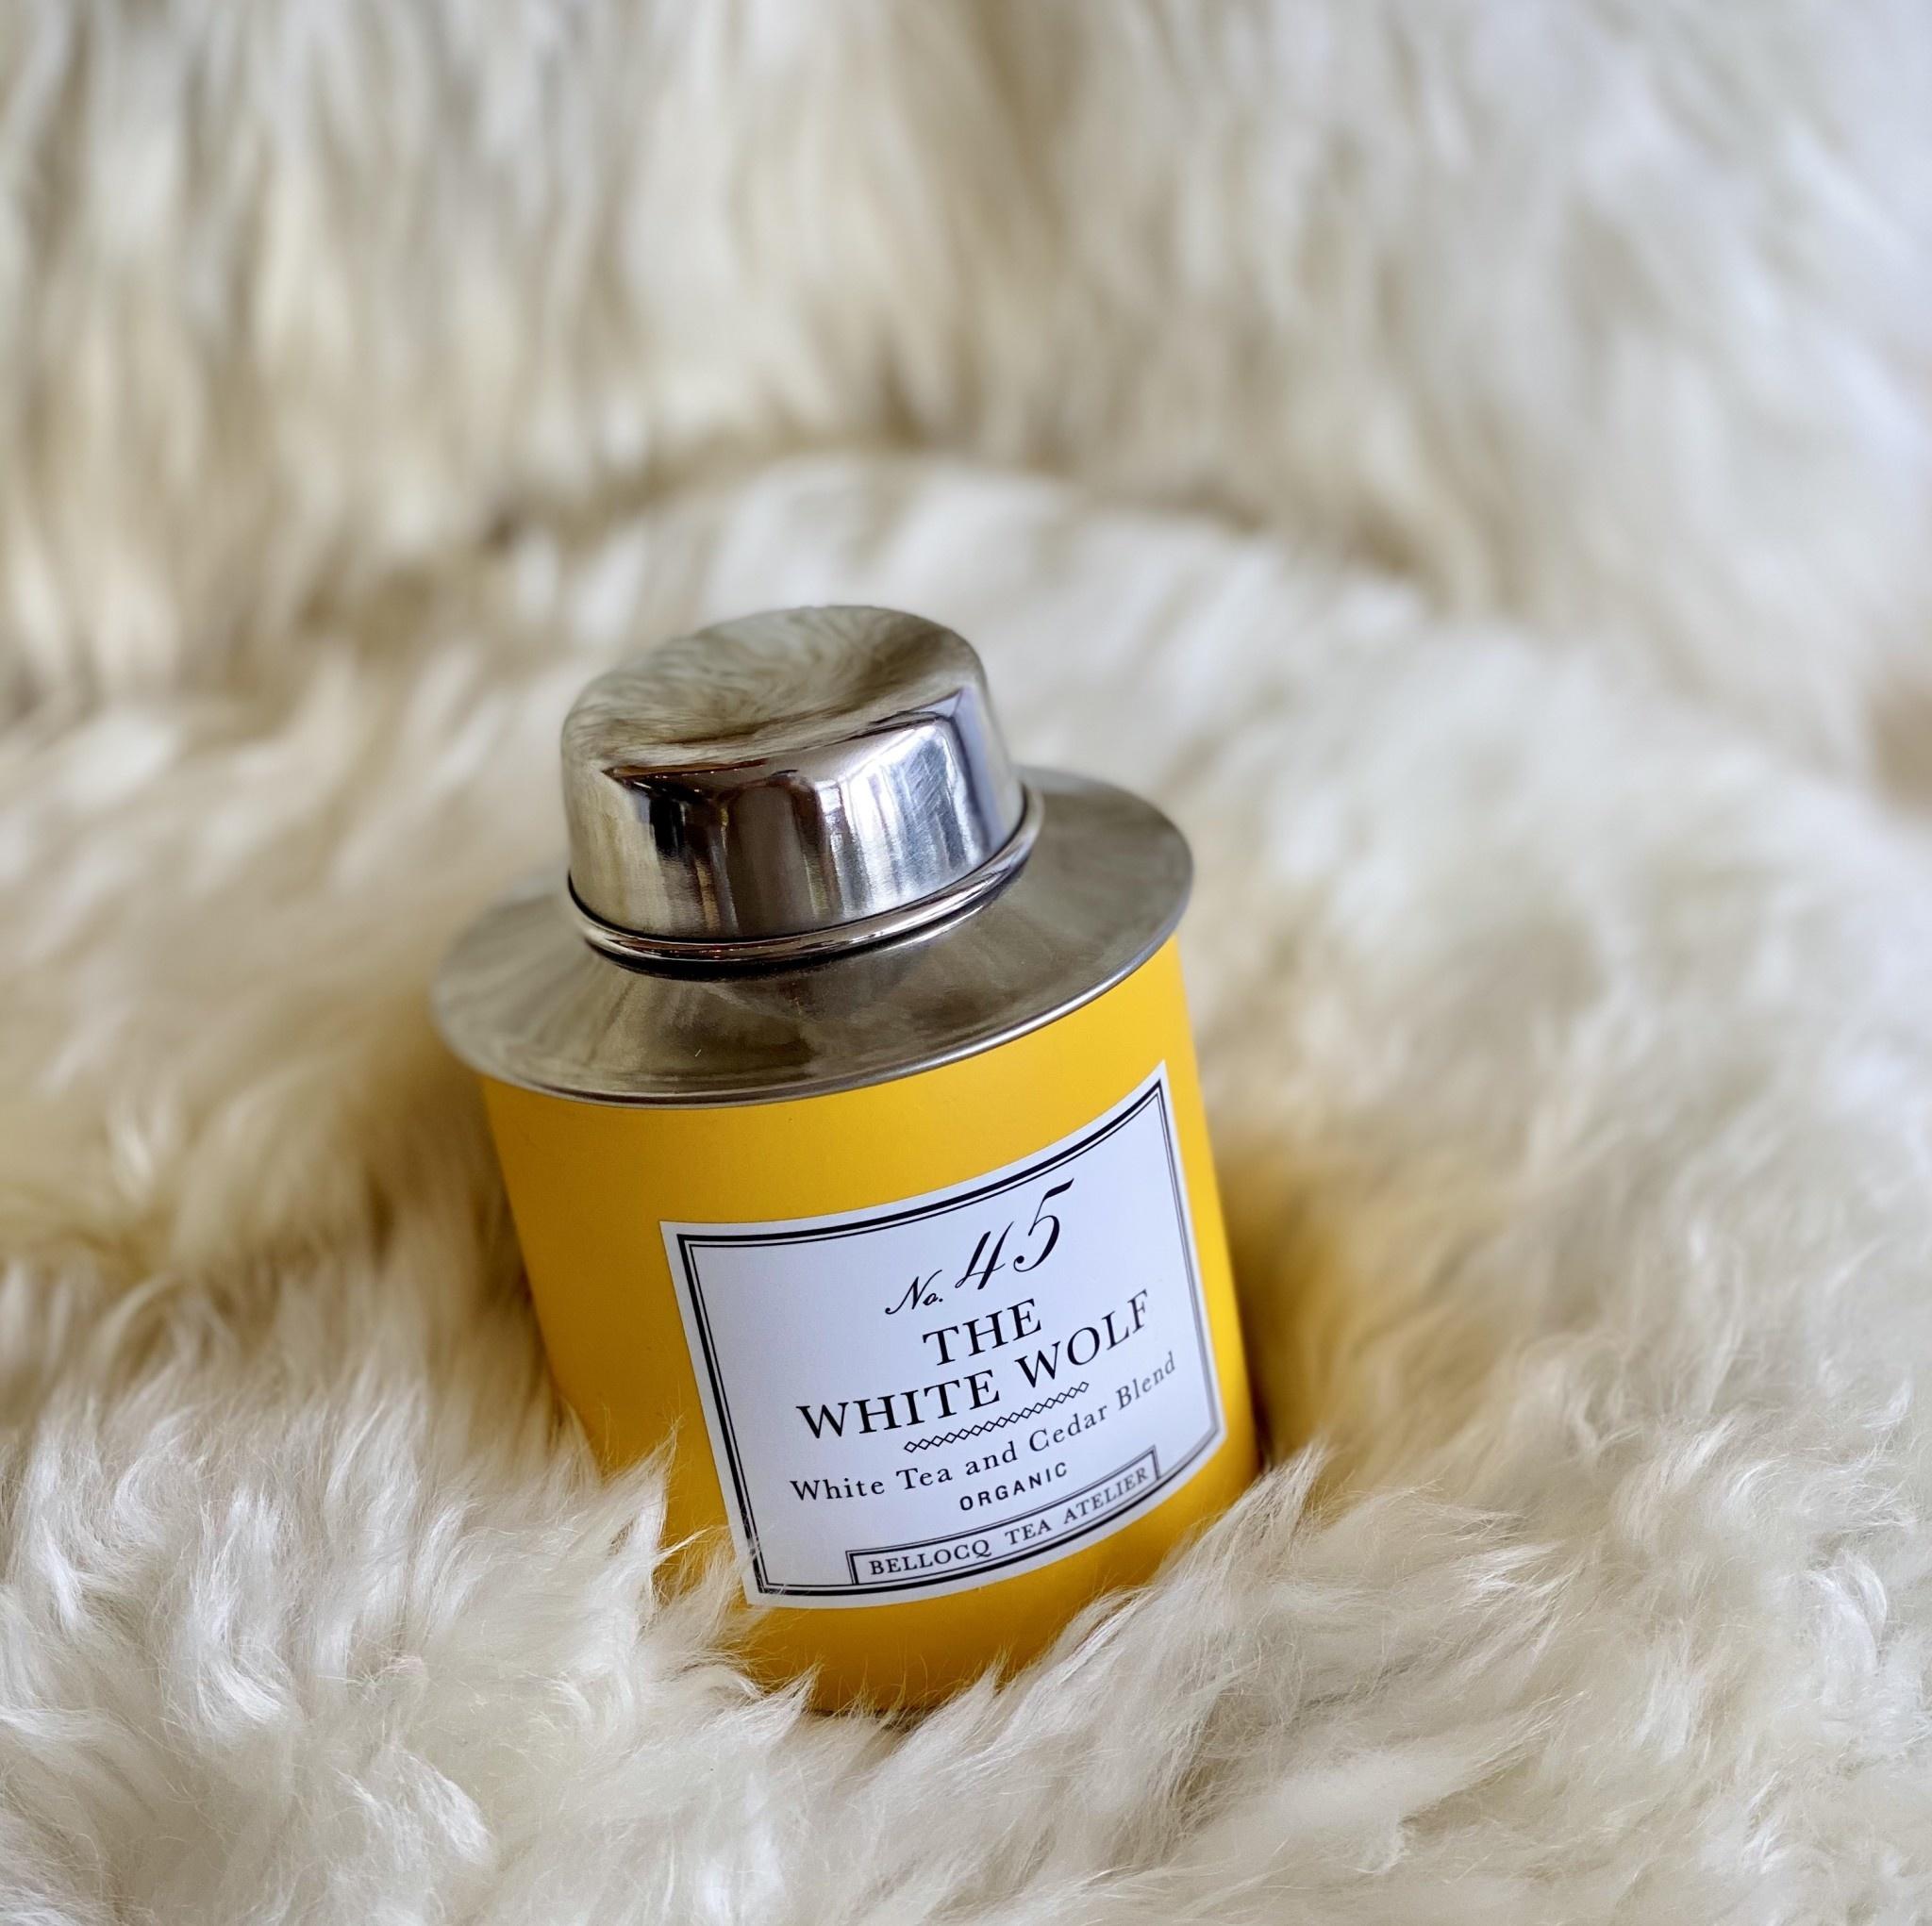 Bellocq Bellocq The White Wolf - Traveler Caddy Loose Leaf Tea Tin